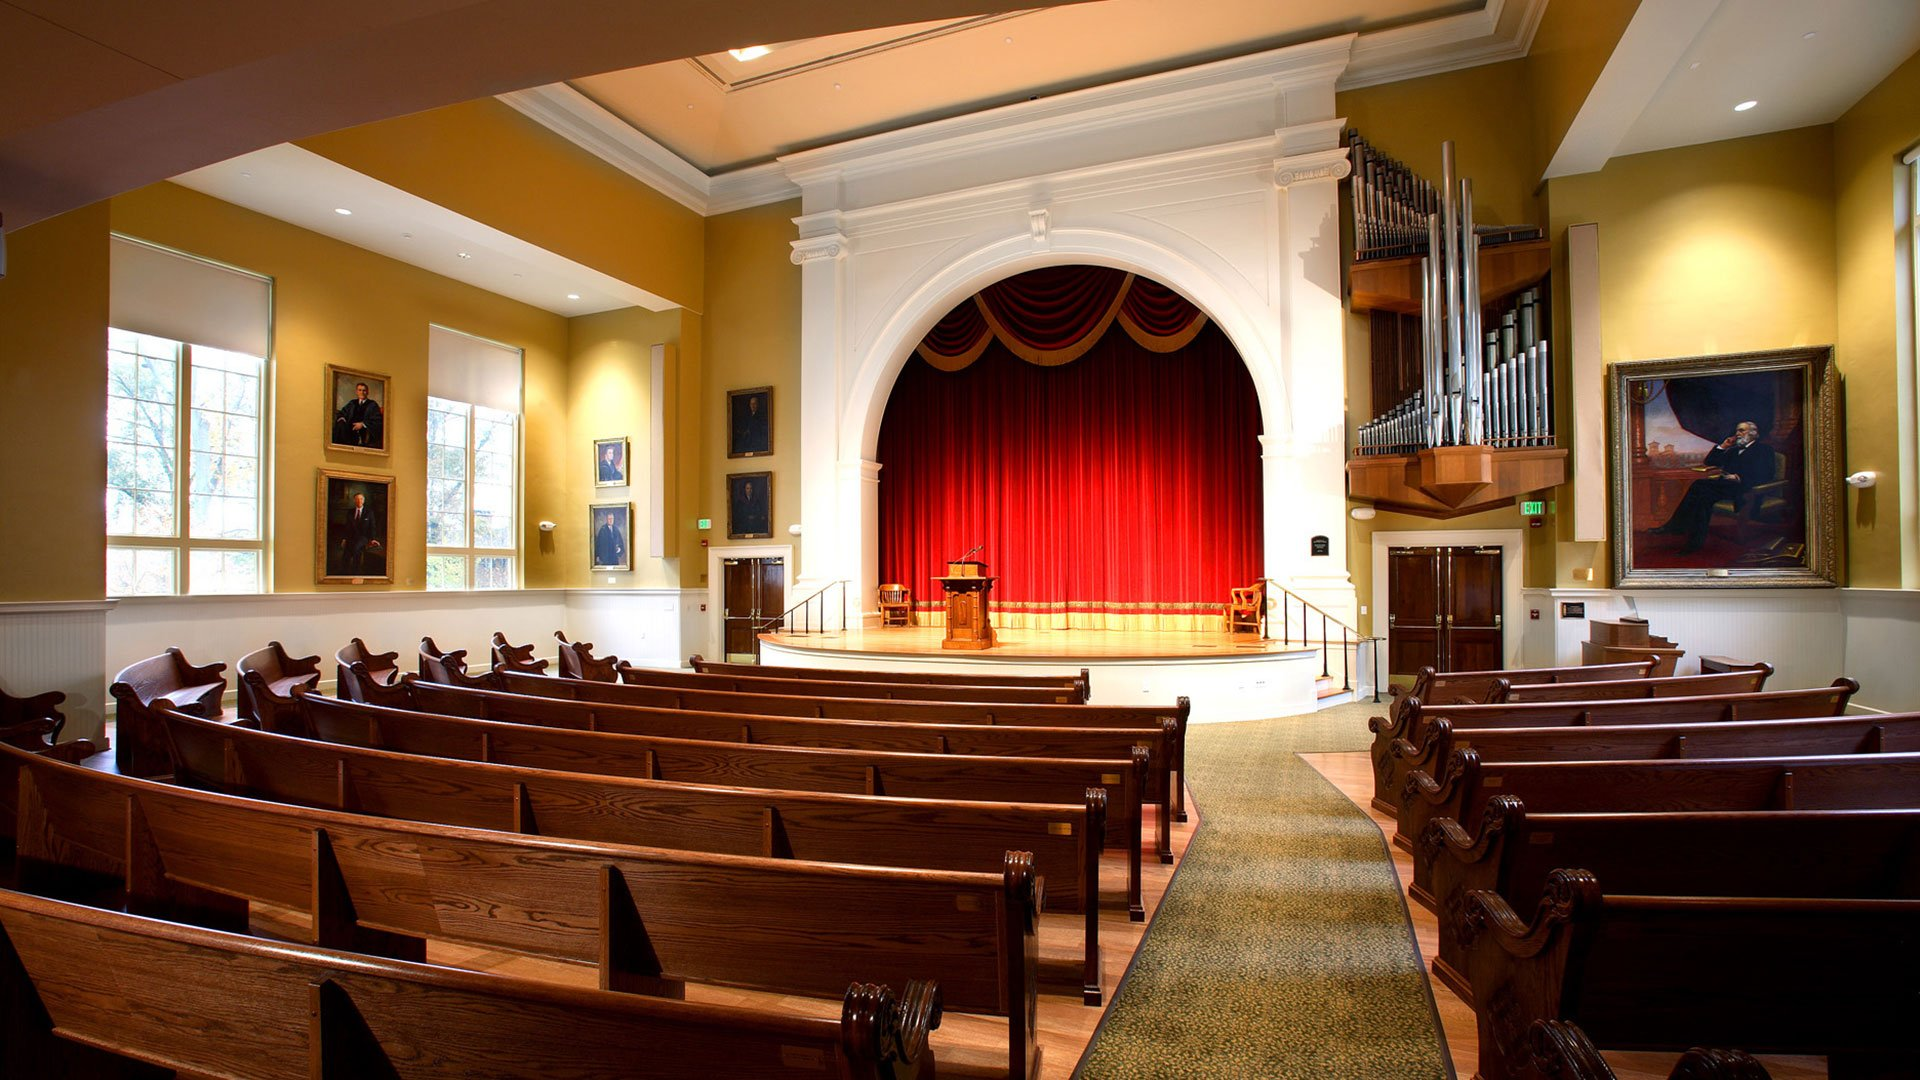 Wofford College, Old Main, Leonard Auditorium